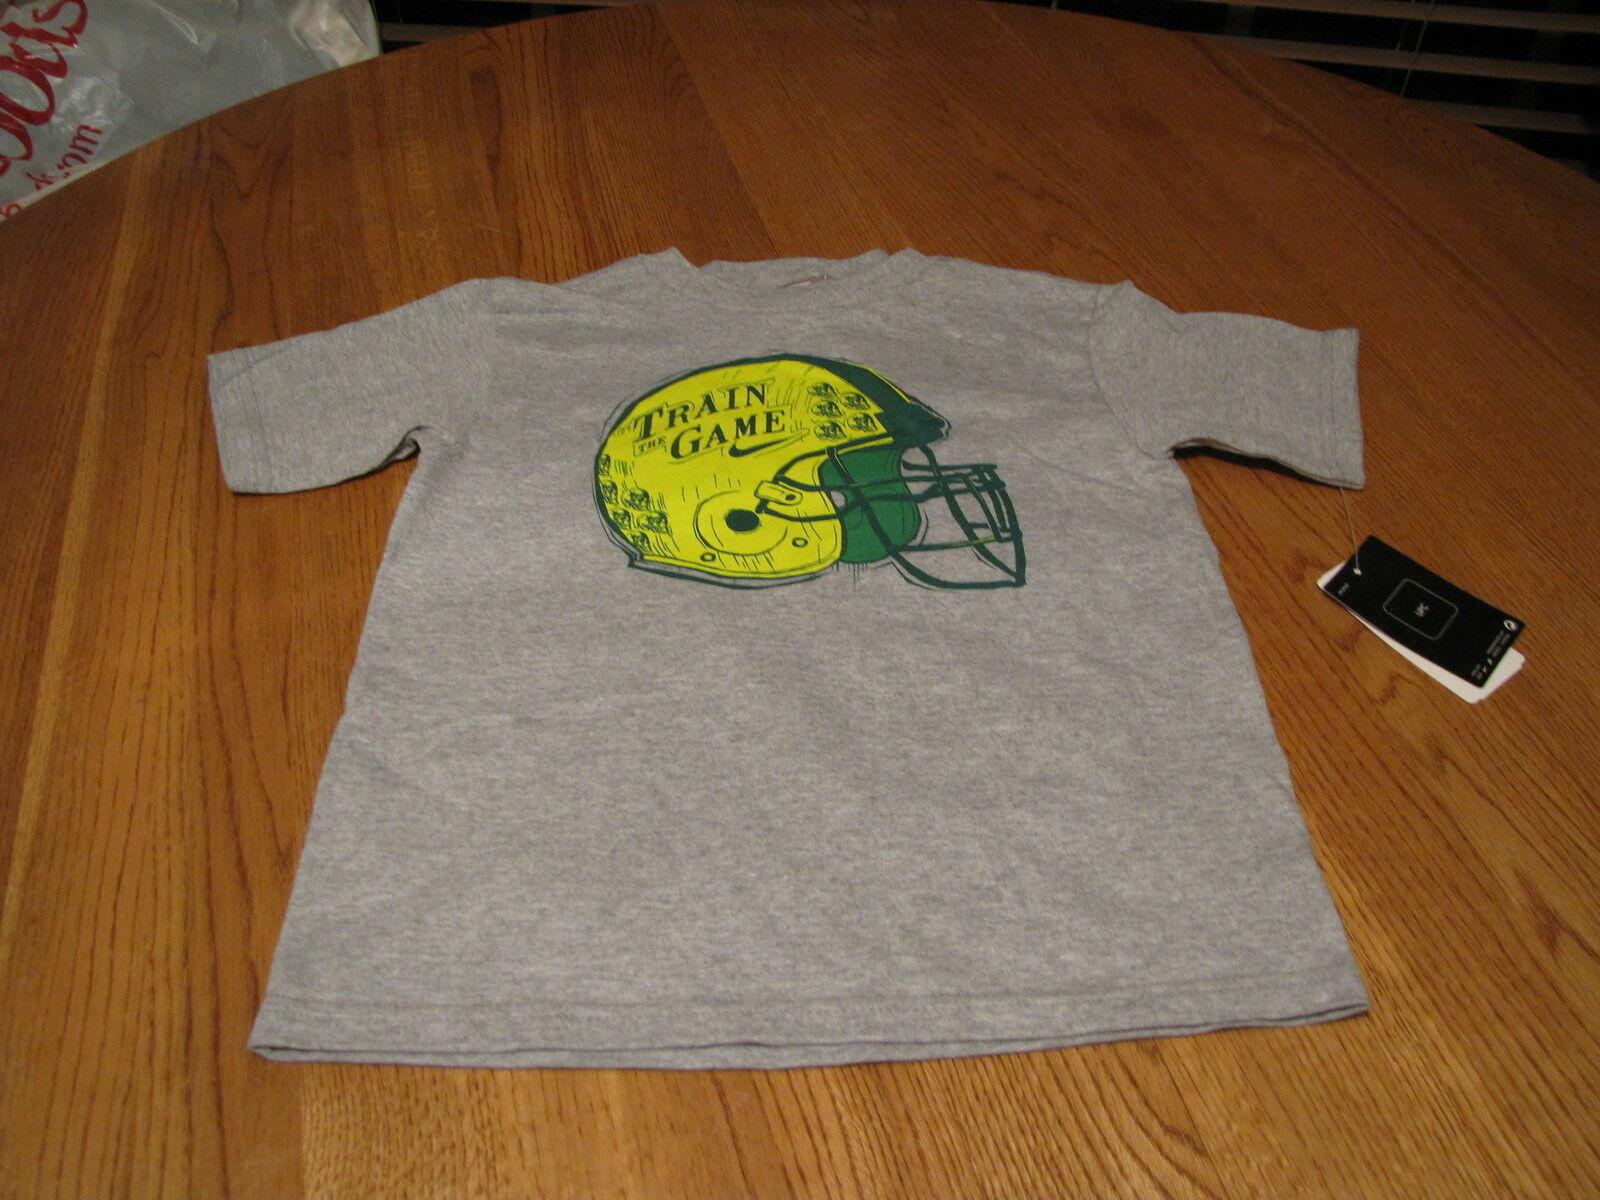 Boy's Nike youth helmet logo grey heather 2T Train the game football T shirt NEW